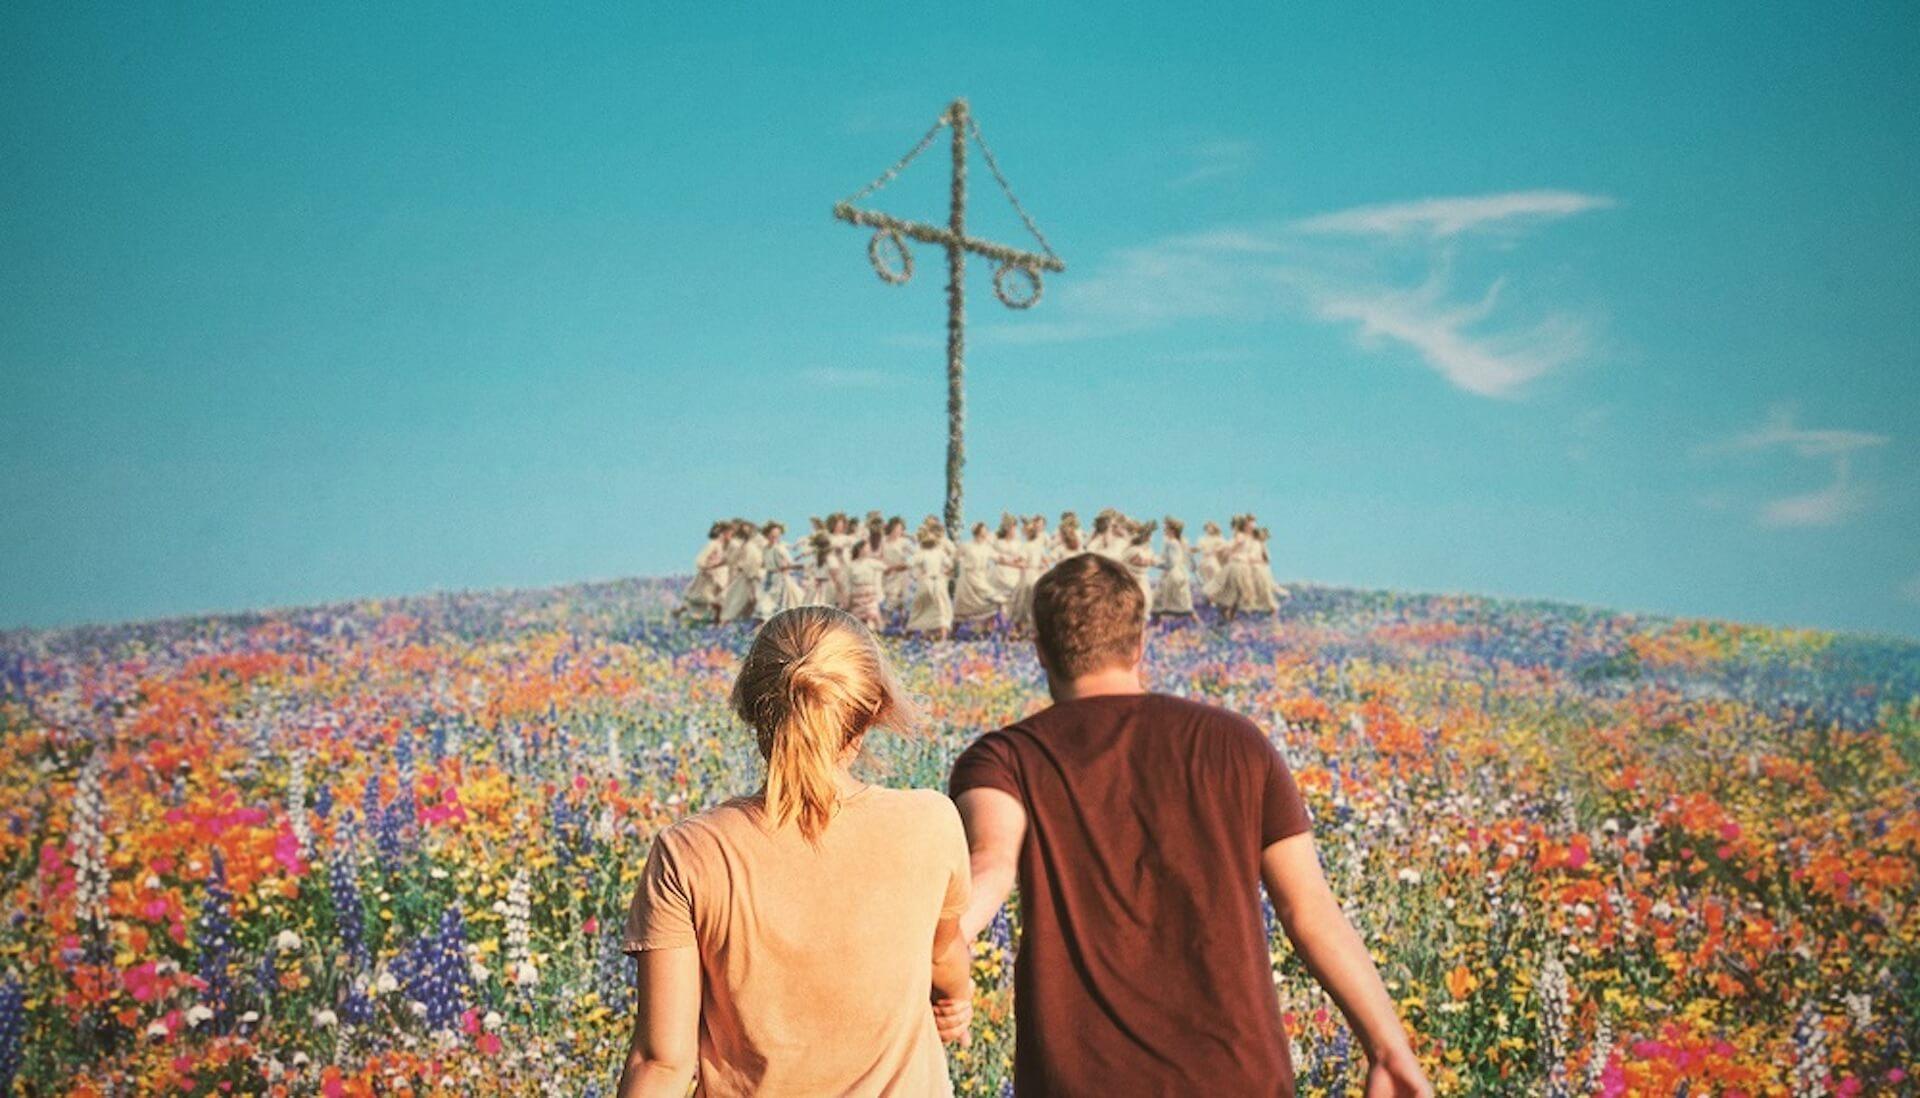 TwitterやInstagramで祝祭が始まる…映画『ミッドサマー』SNSお花畑プレゼントキャンペーンが実施 film200120_midsommarflower_01